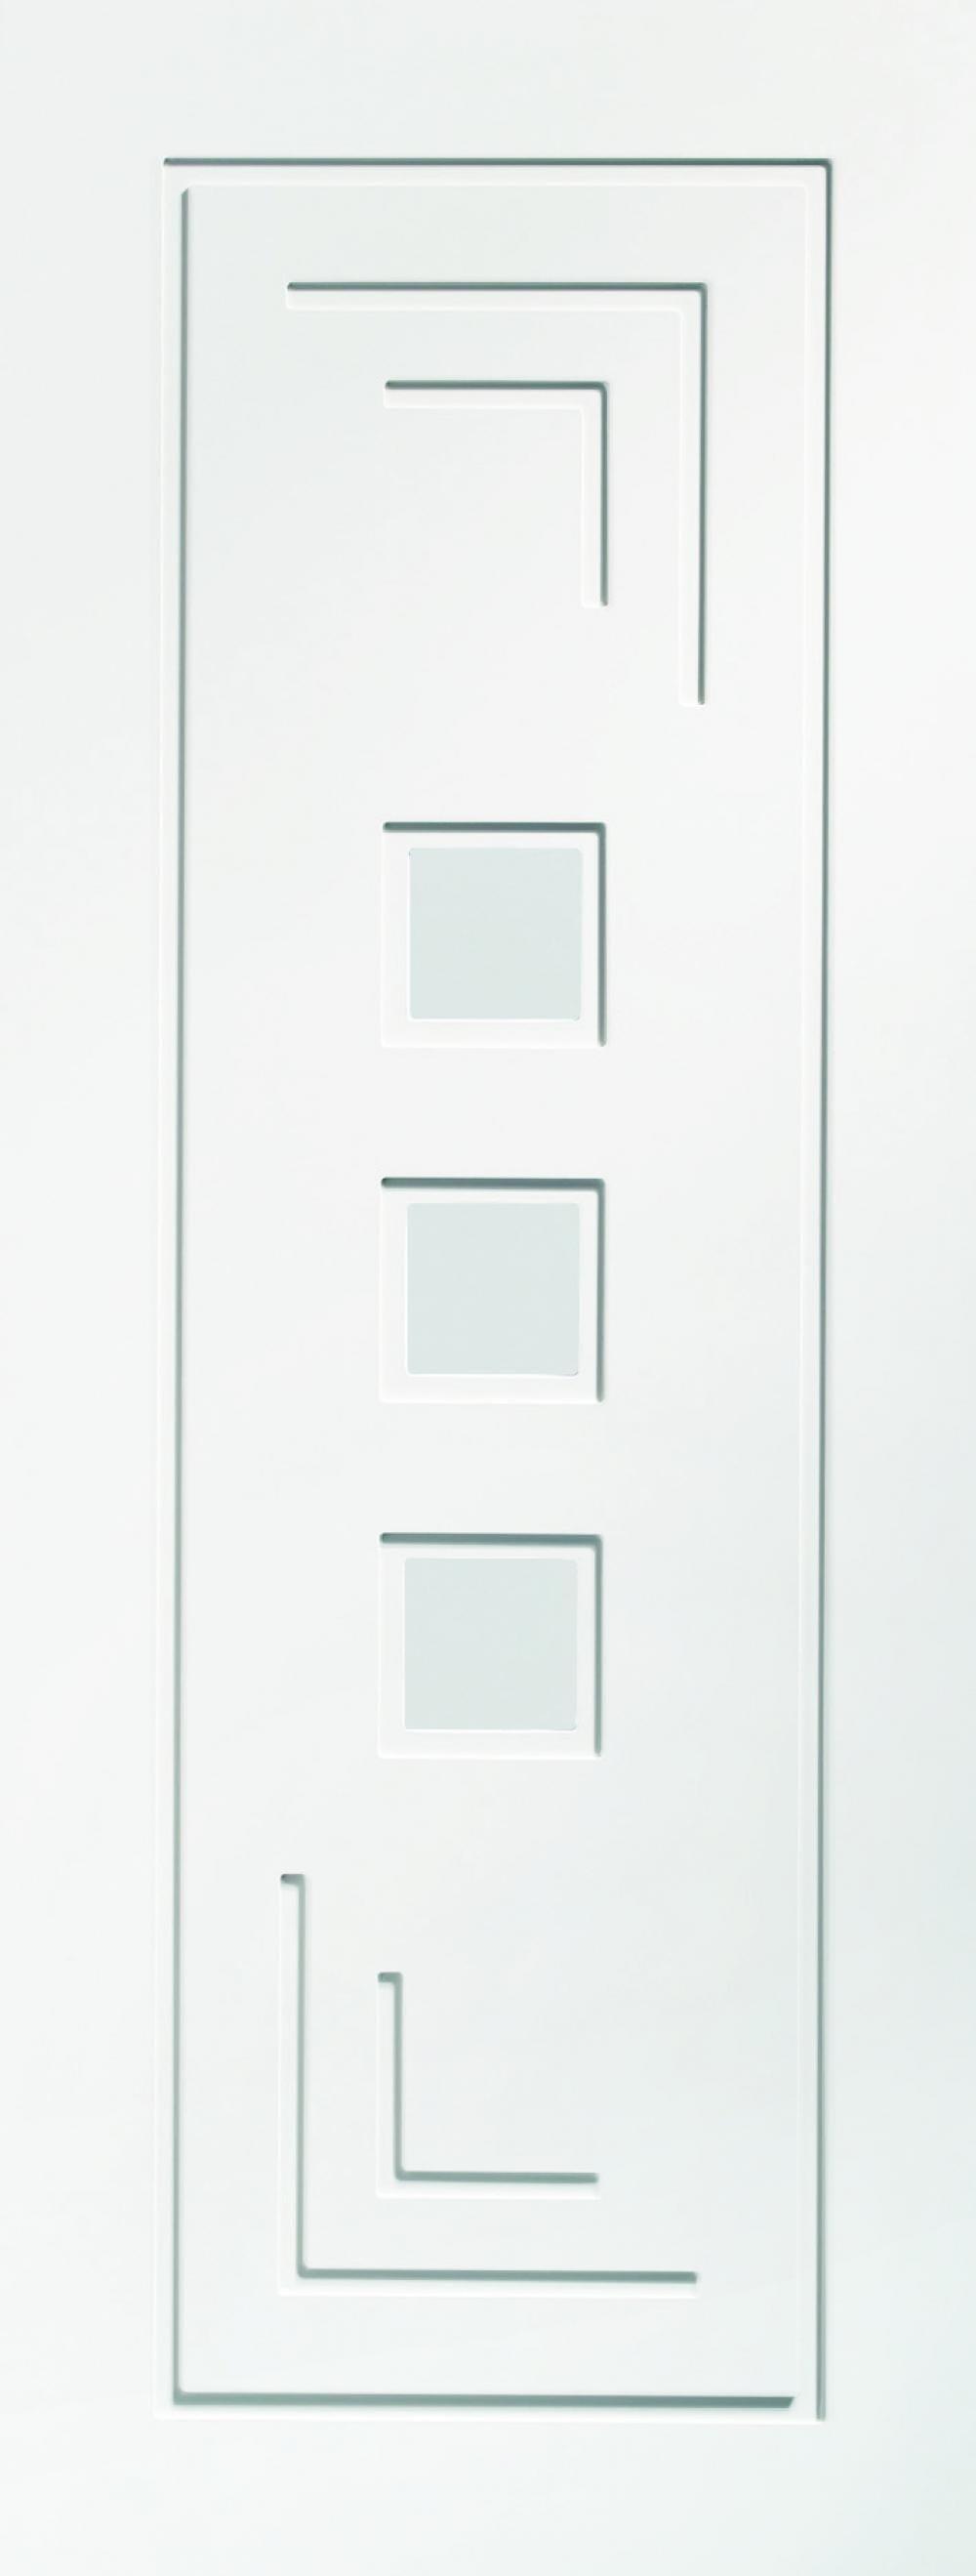 Altino White - Clear Glass Image